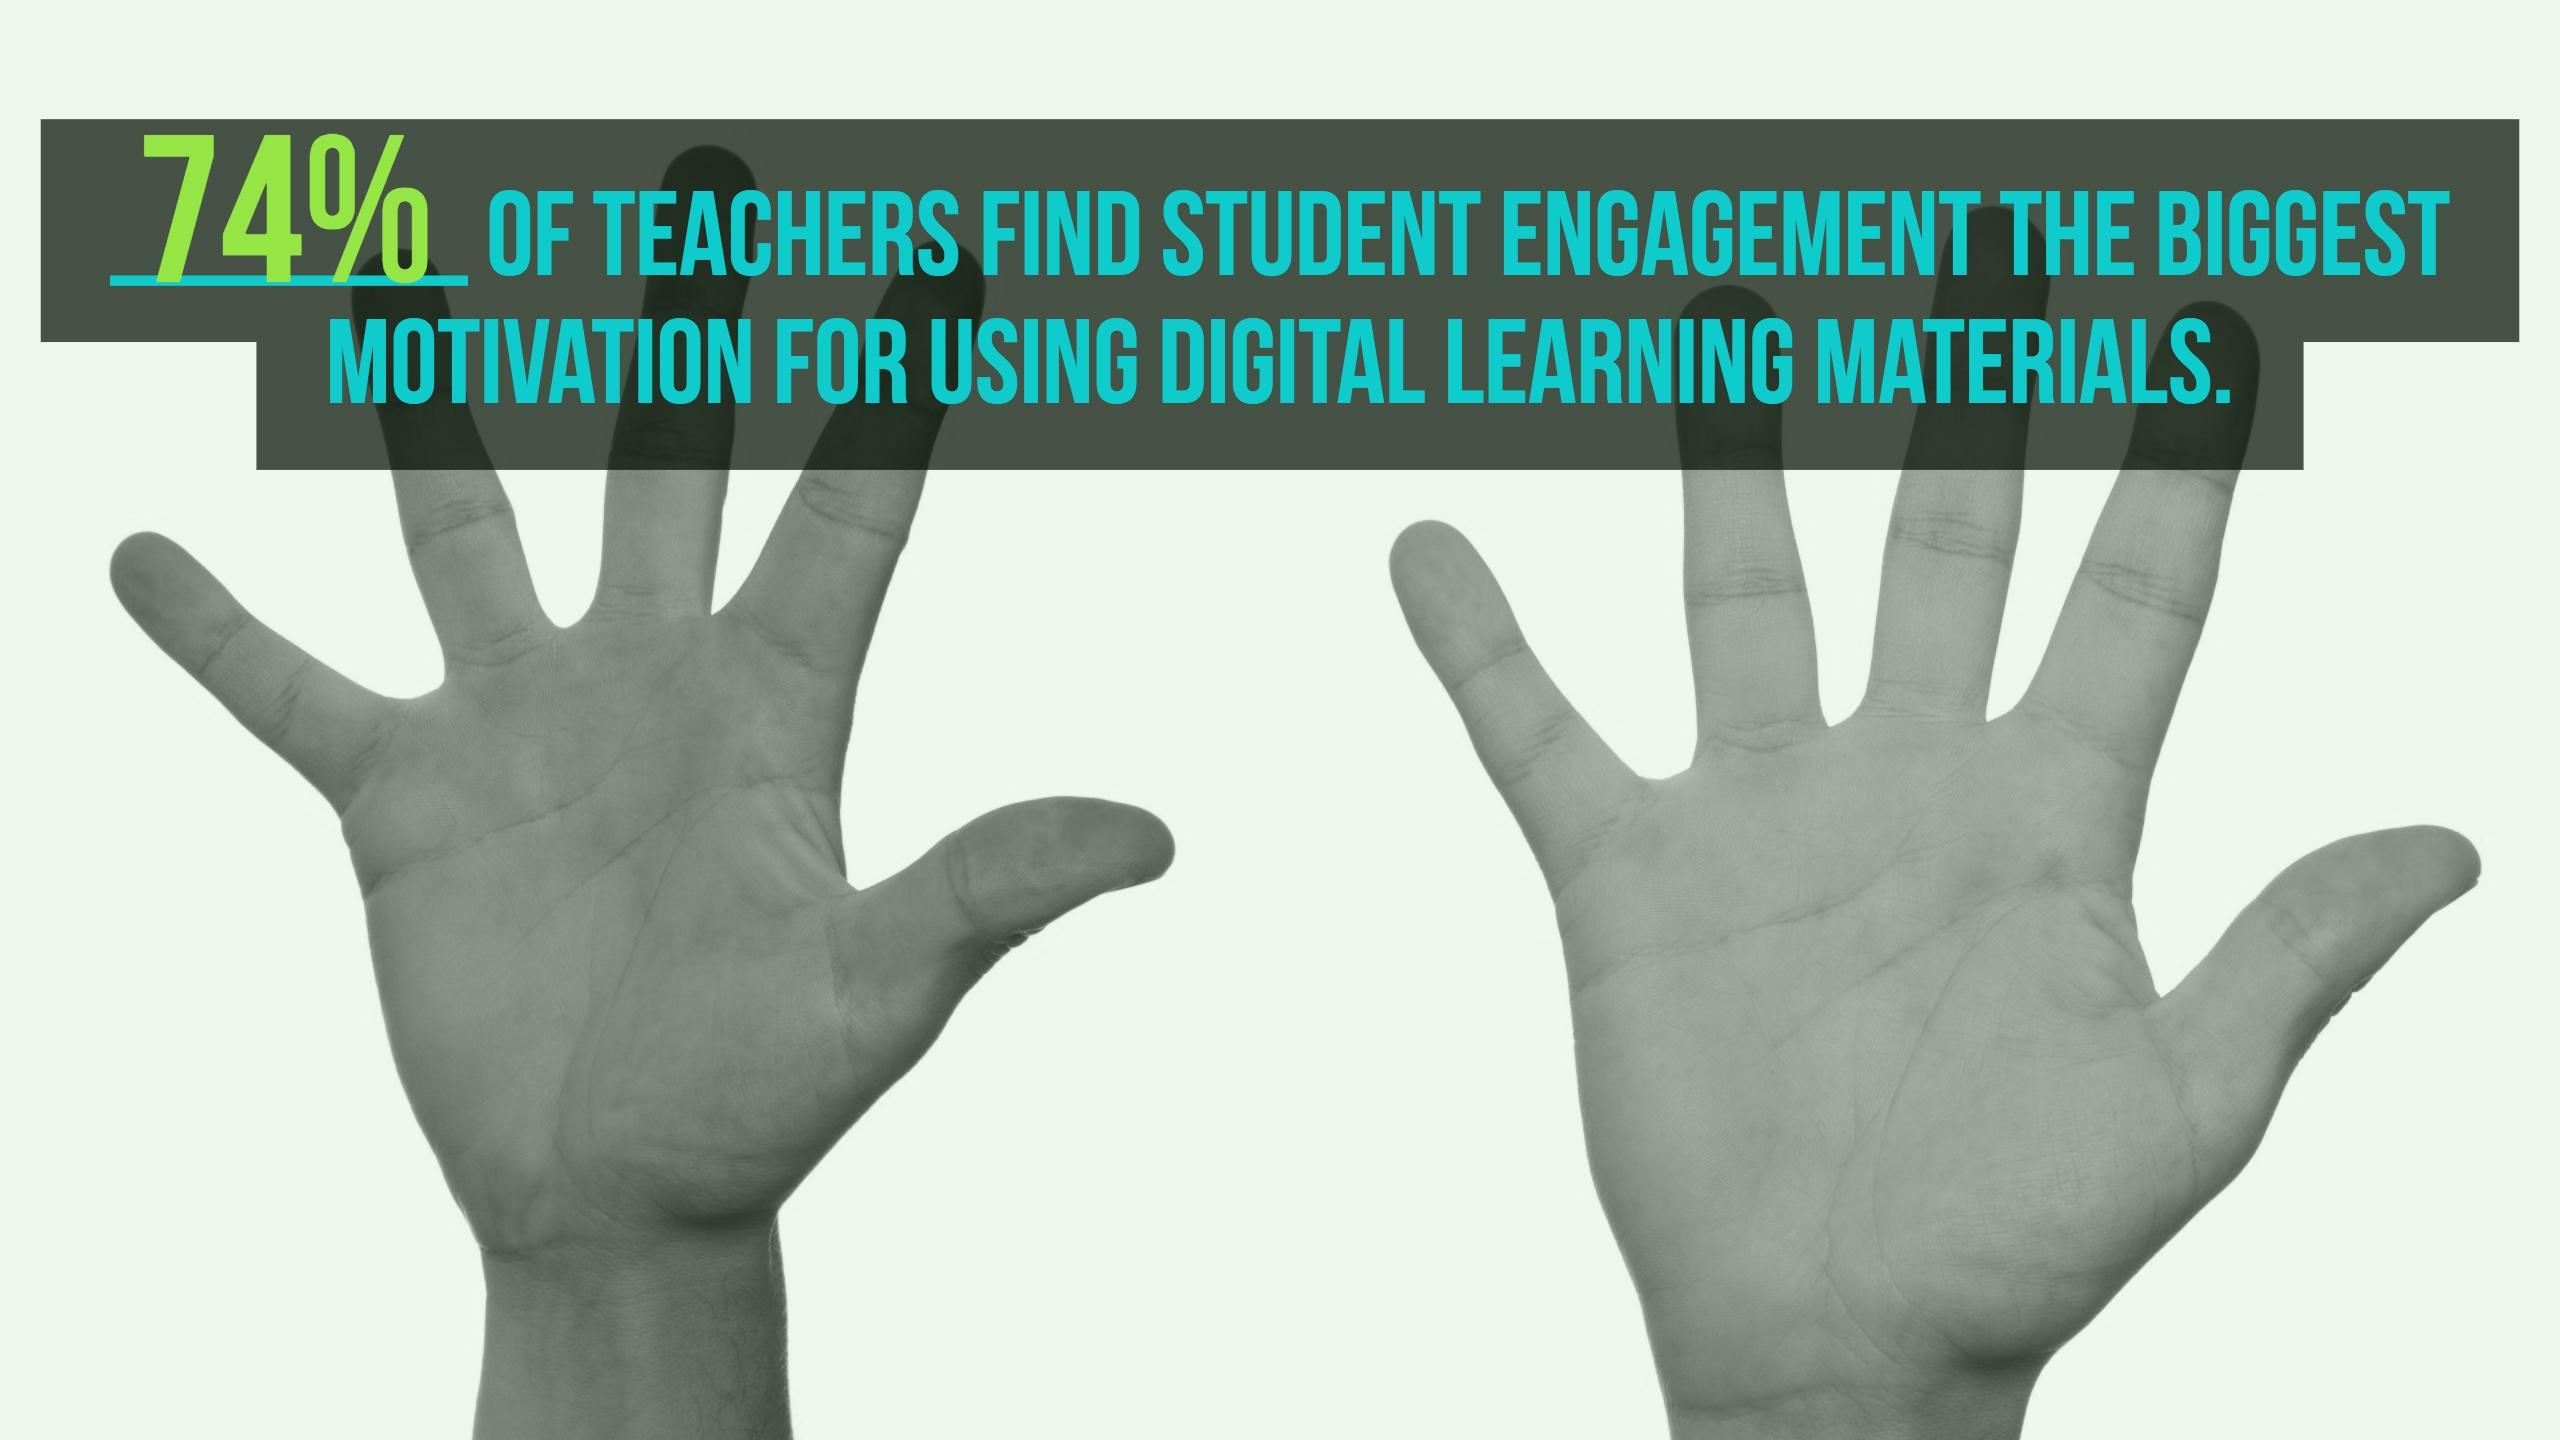 Digital learning materials